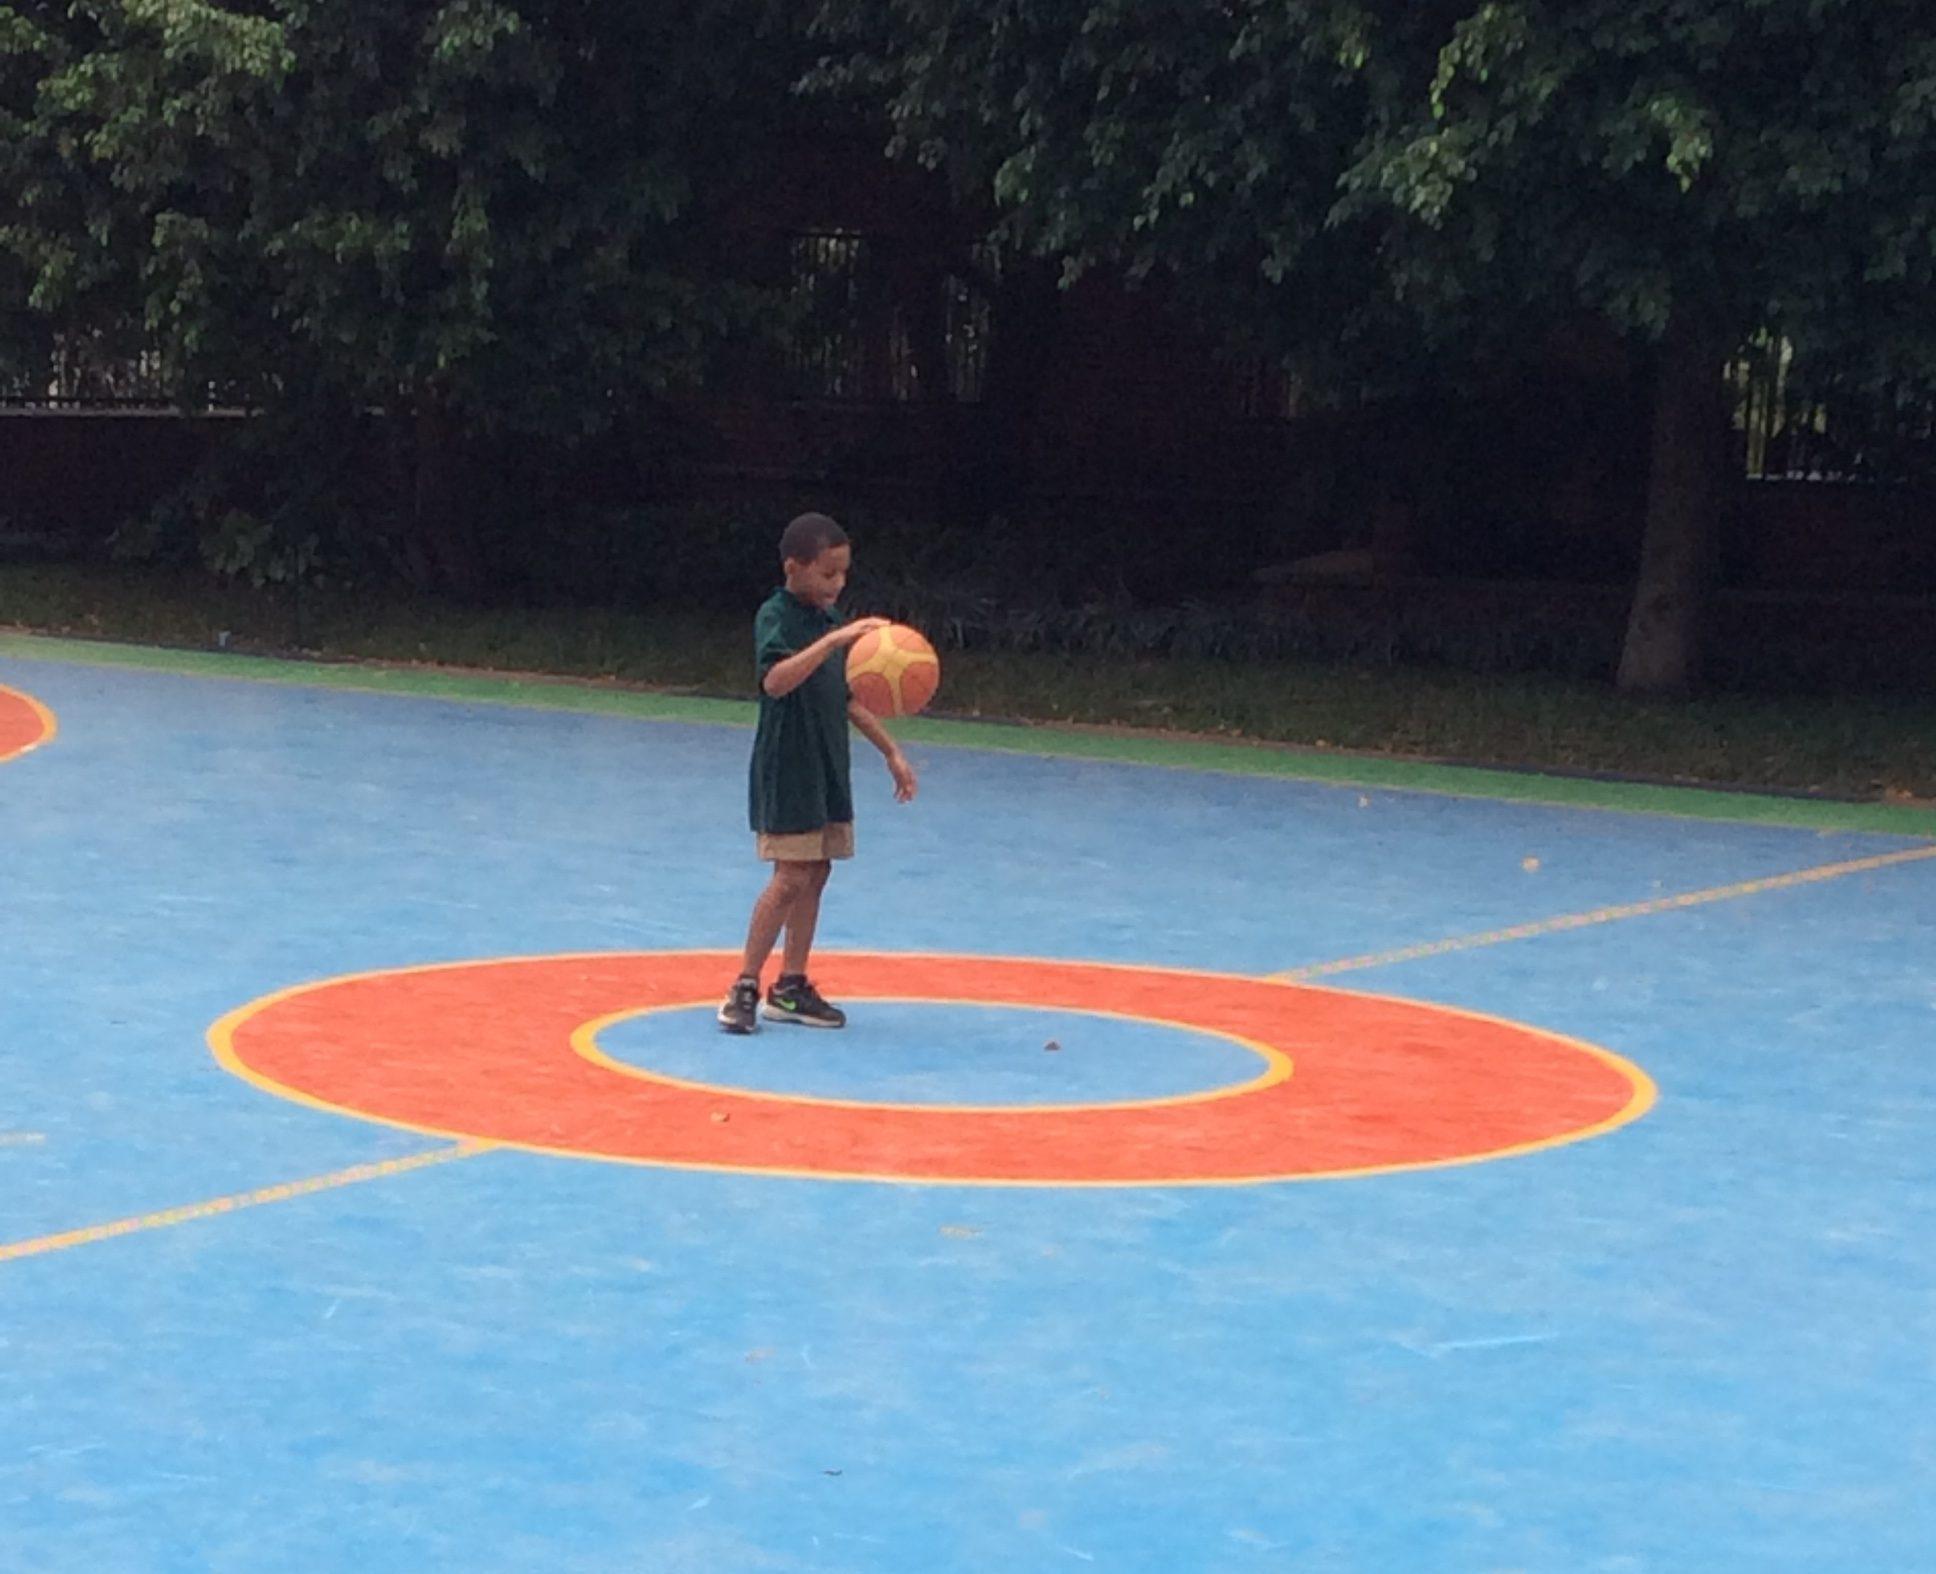 Kristen's son shooting some hoops.